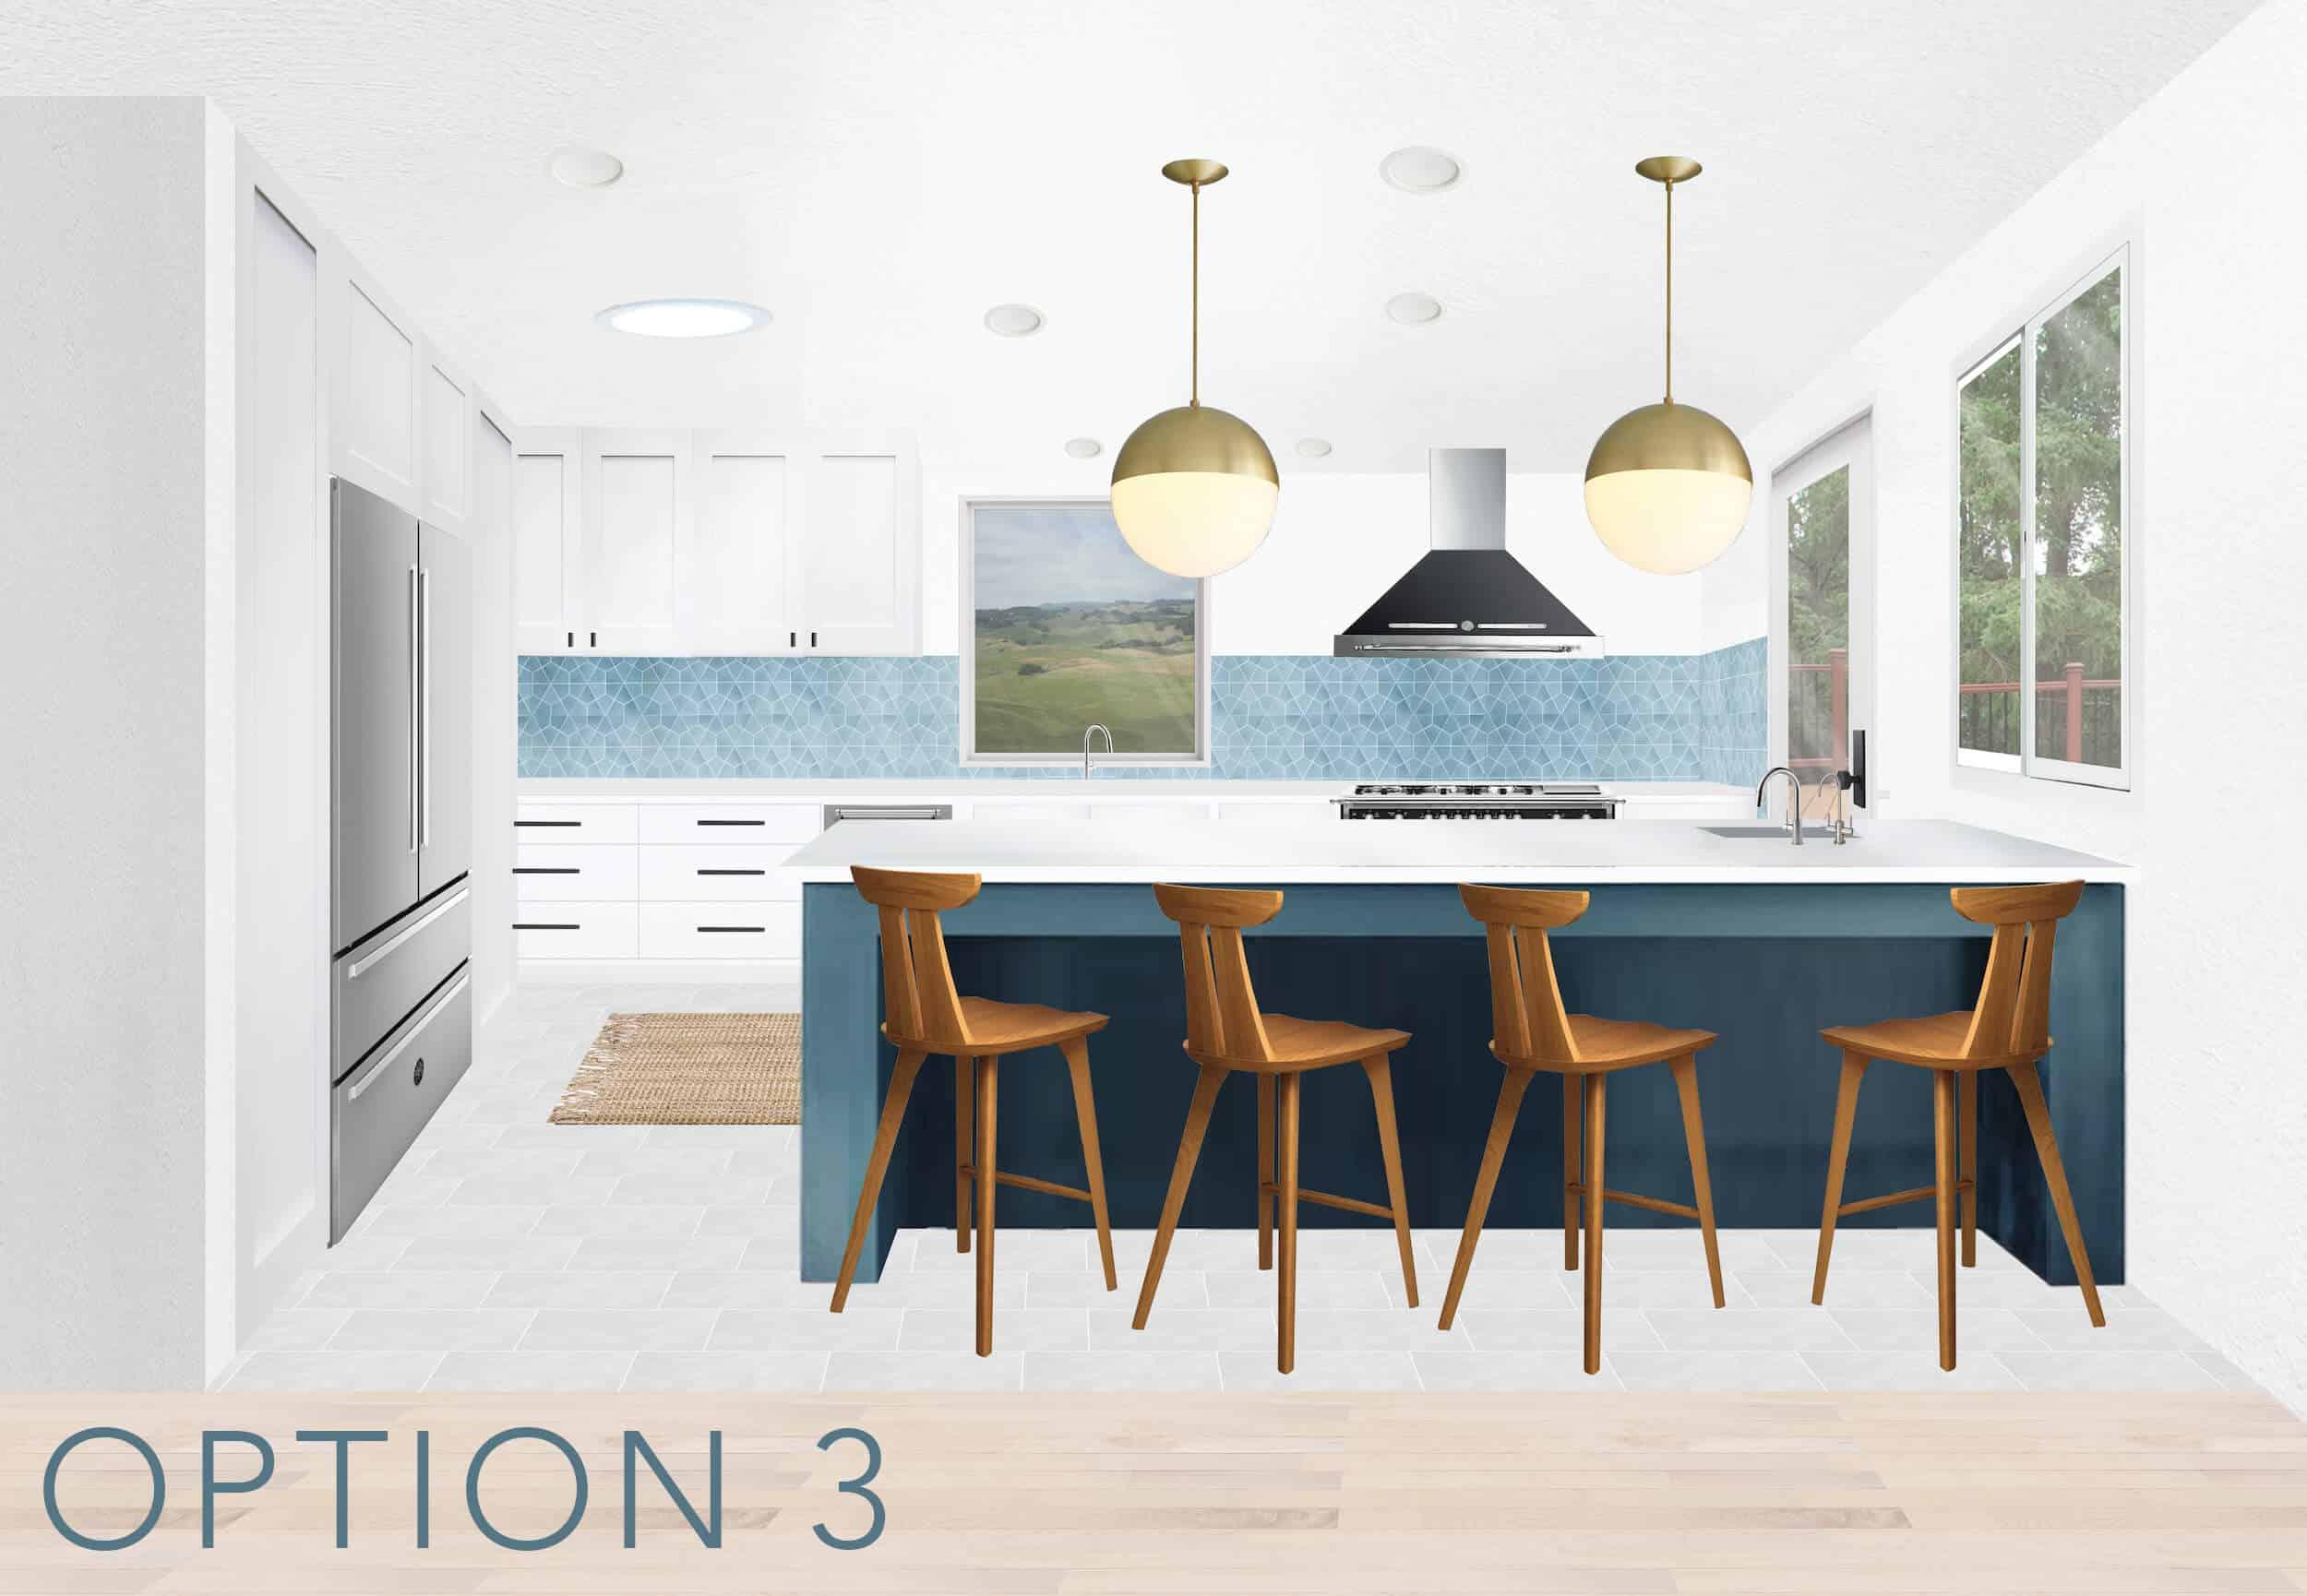 catherines-kitchen-render-option-3-text